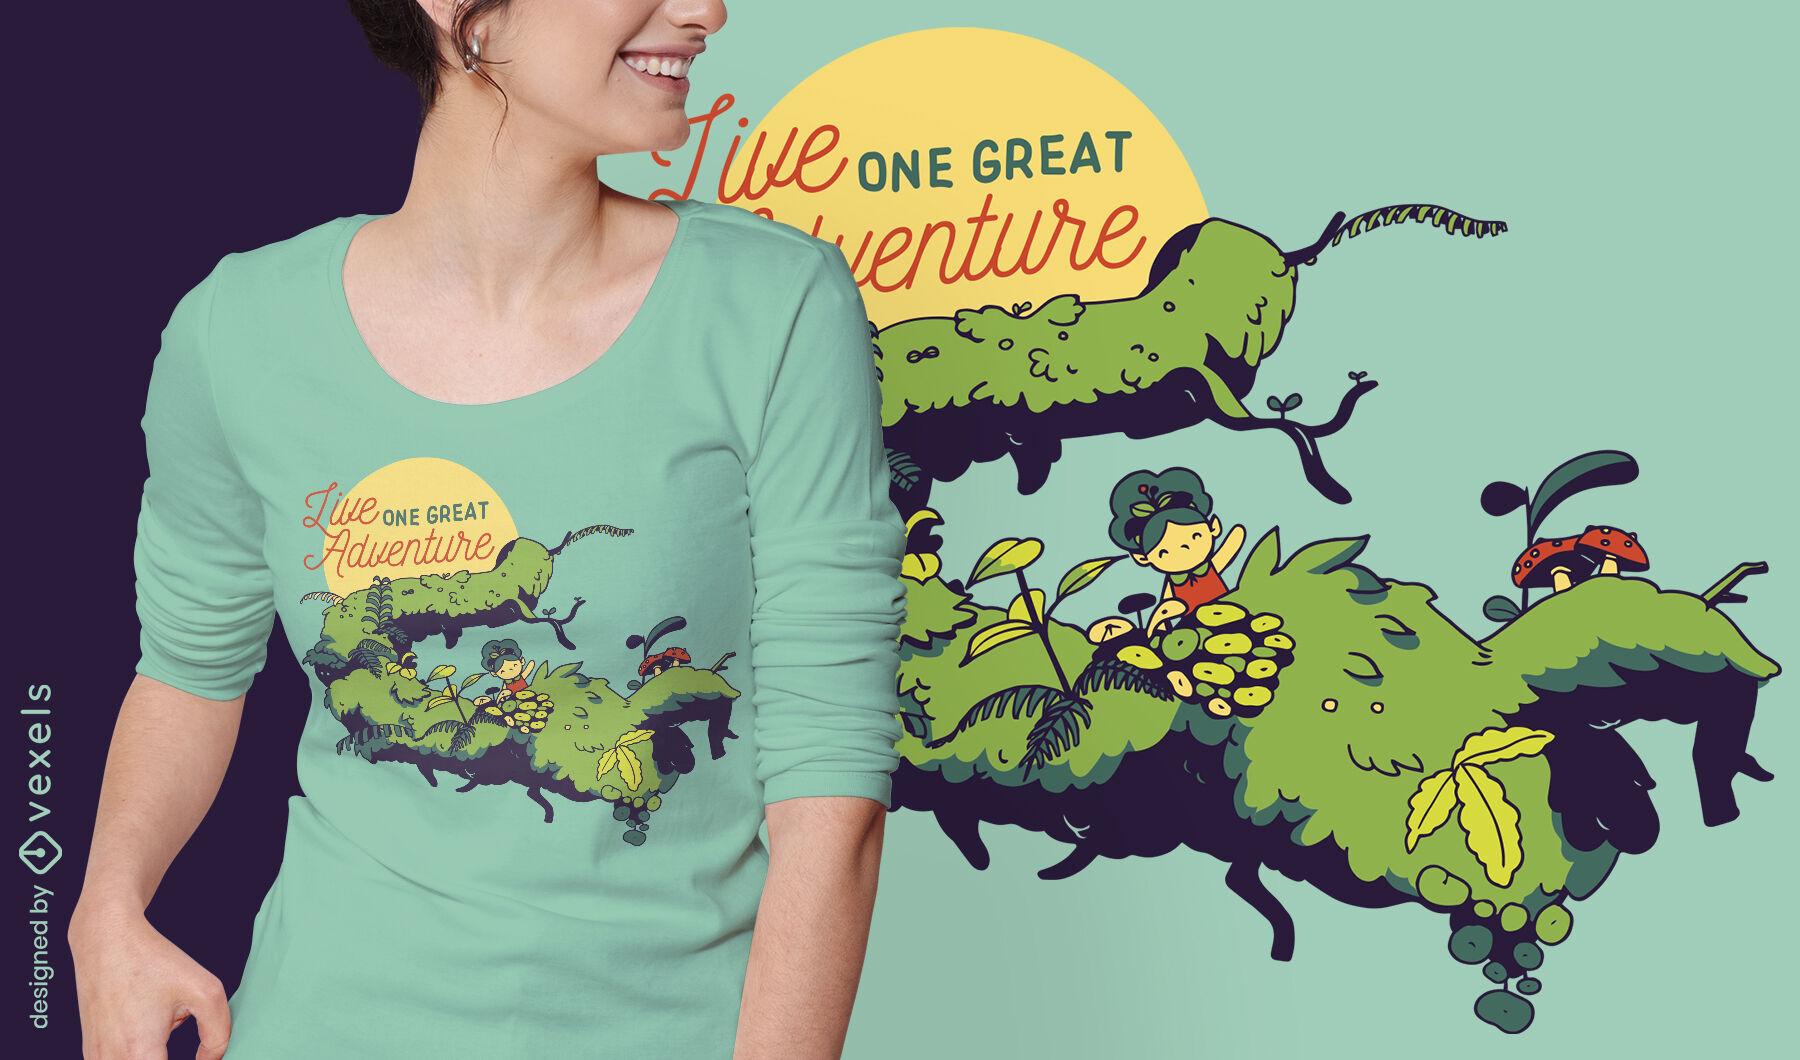 Tiny girl in branch adventure quote diseño de camiseta